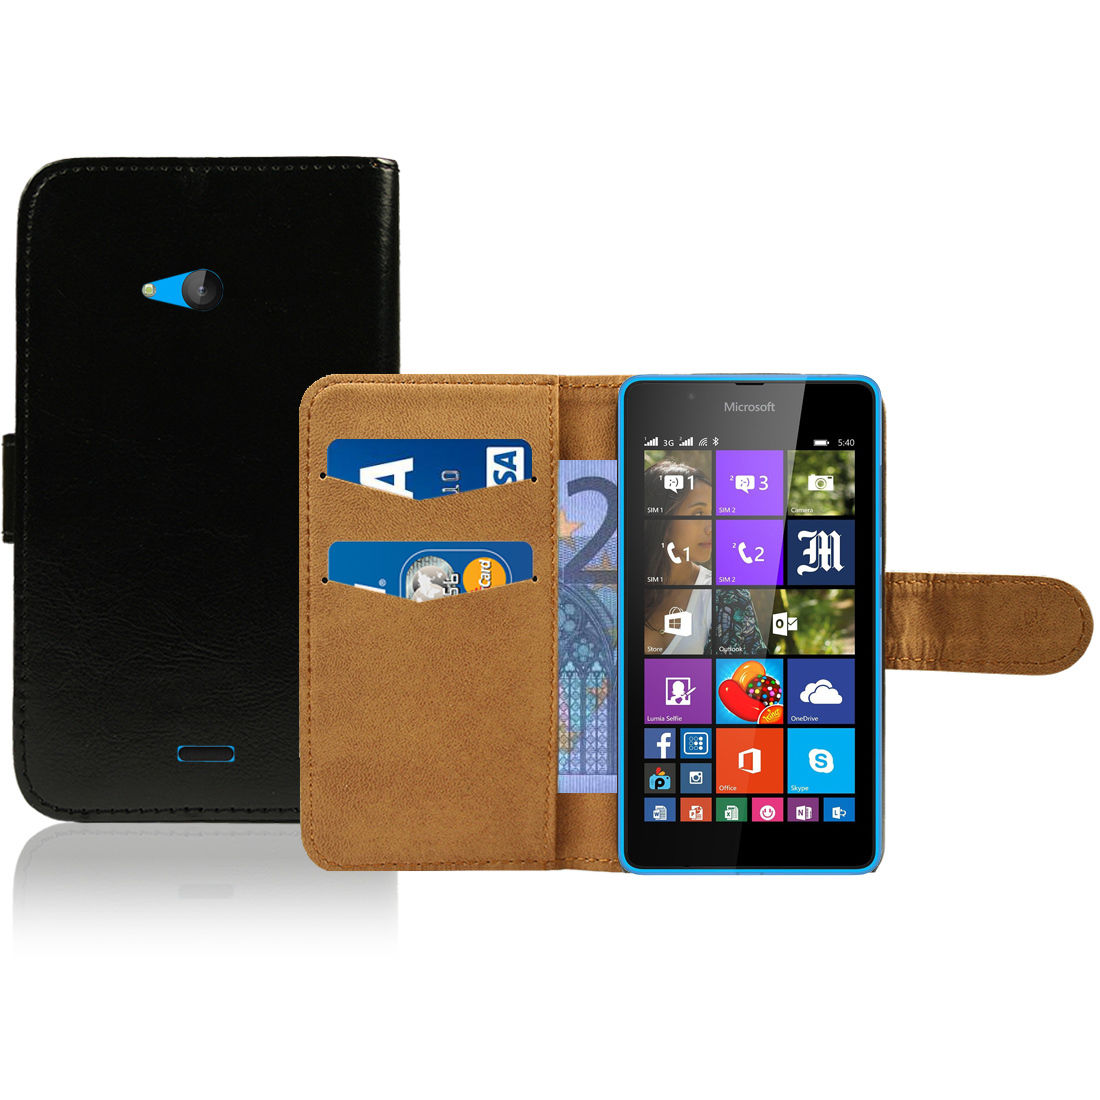 Pouzdro pro Microsoft Lumia 540 černé